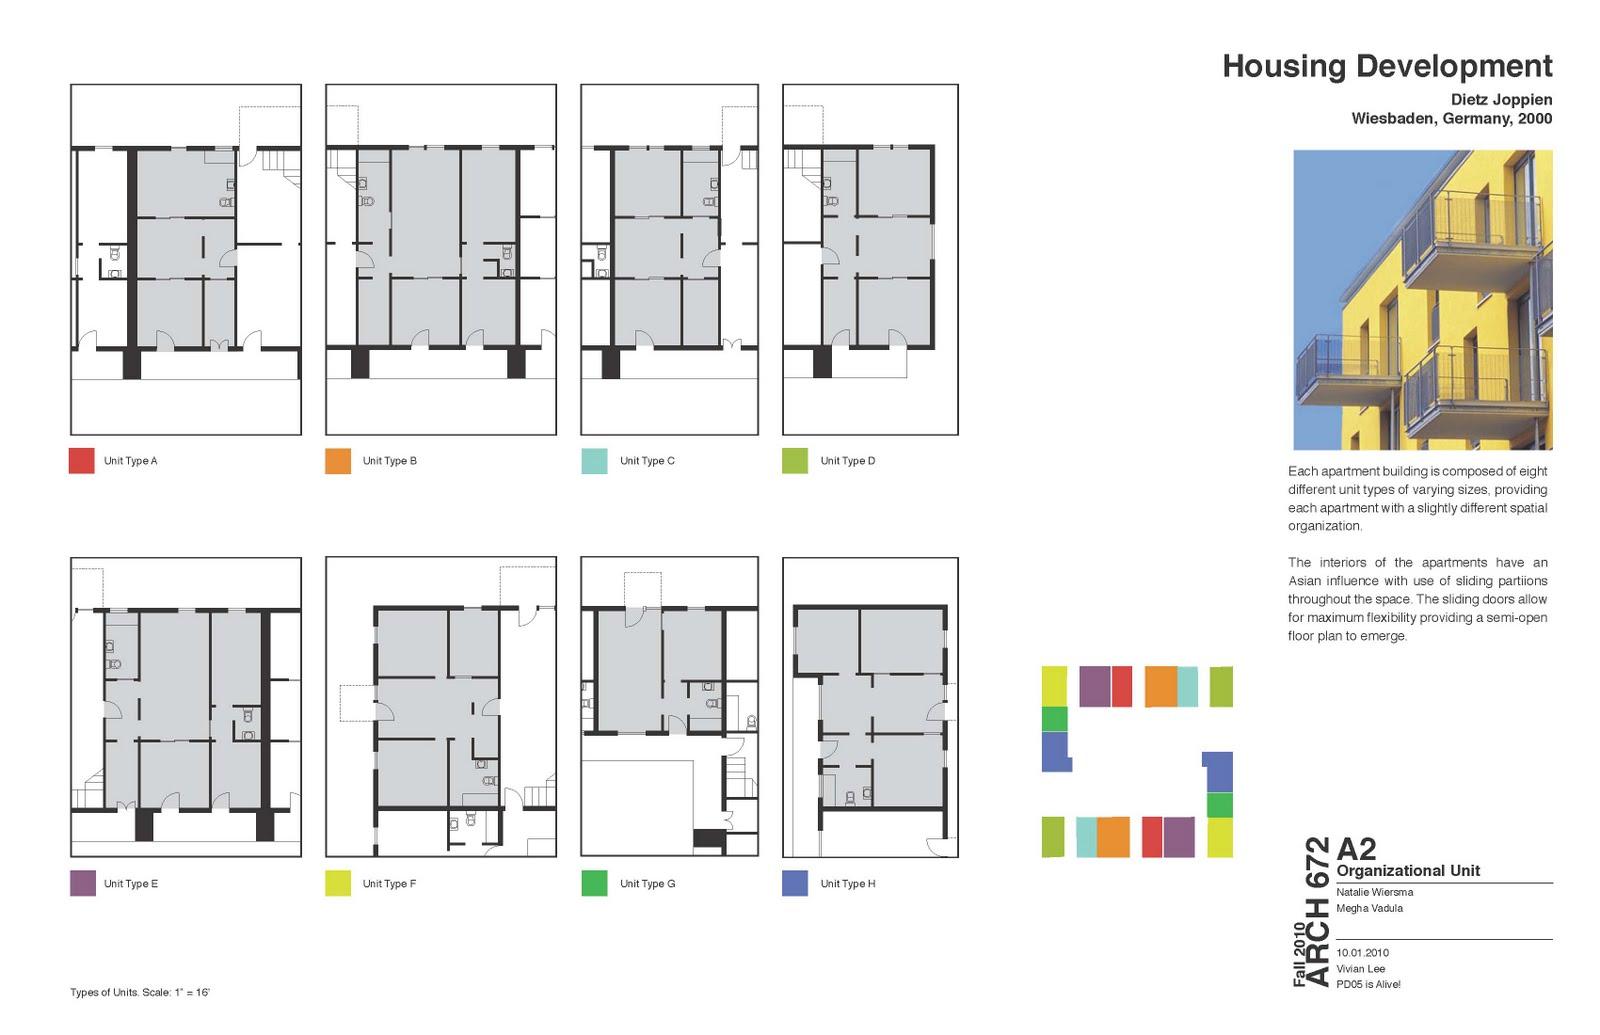 baumholder germany housing floor plans germany home plans baumholder germany housing floor plans germany home plans